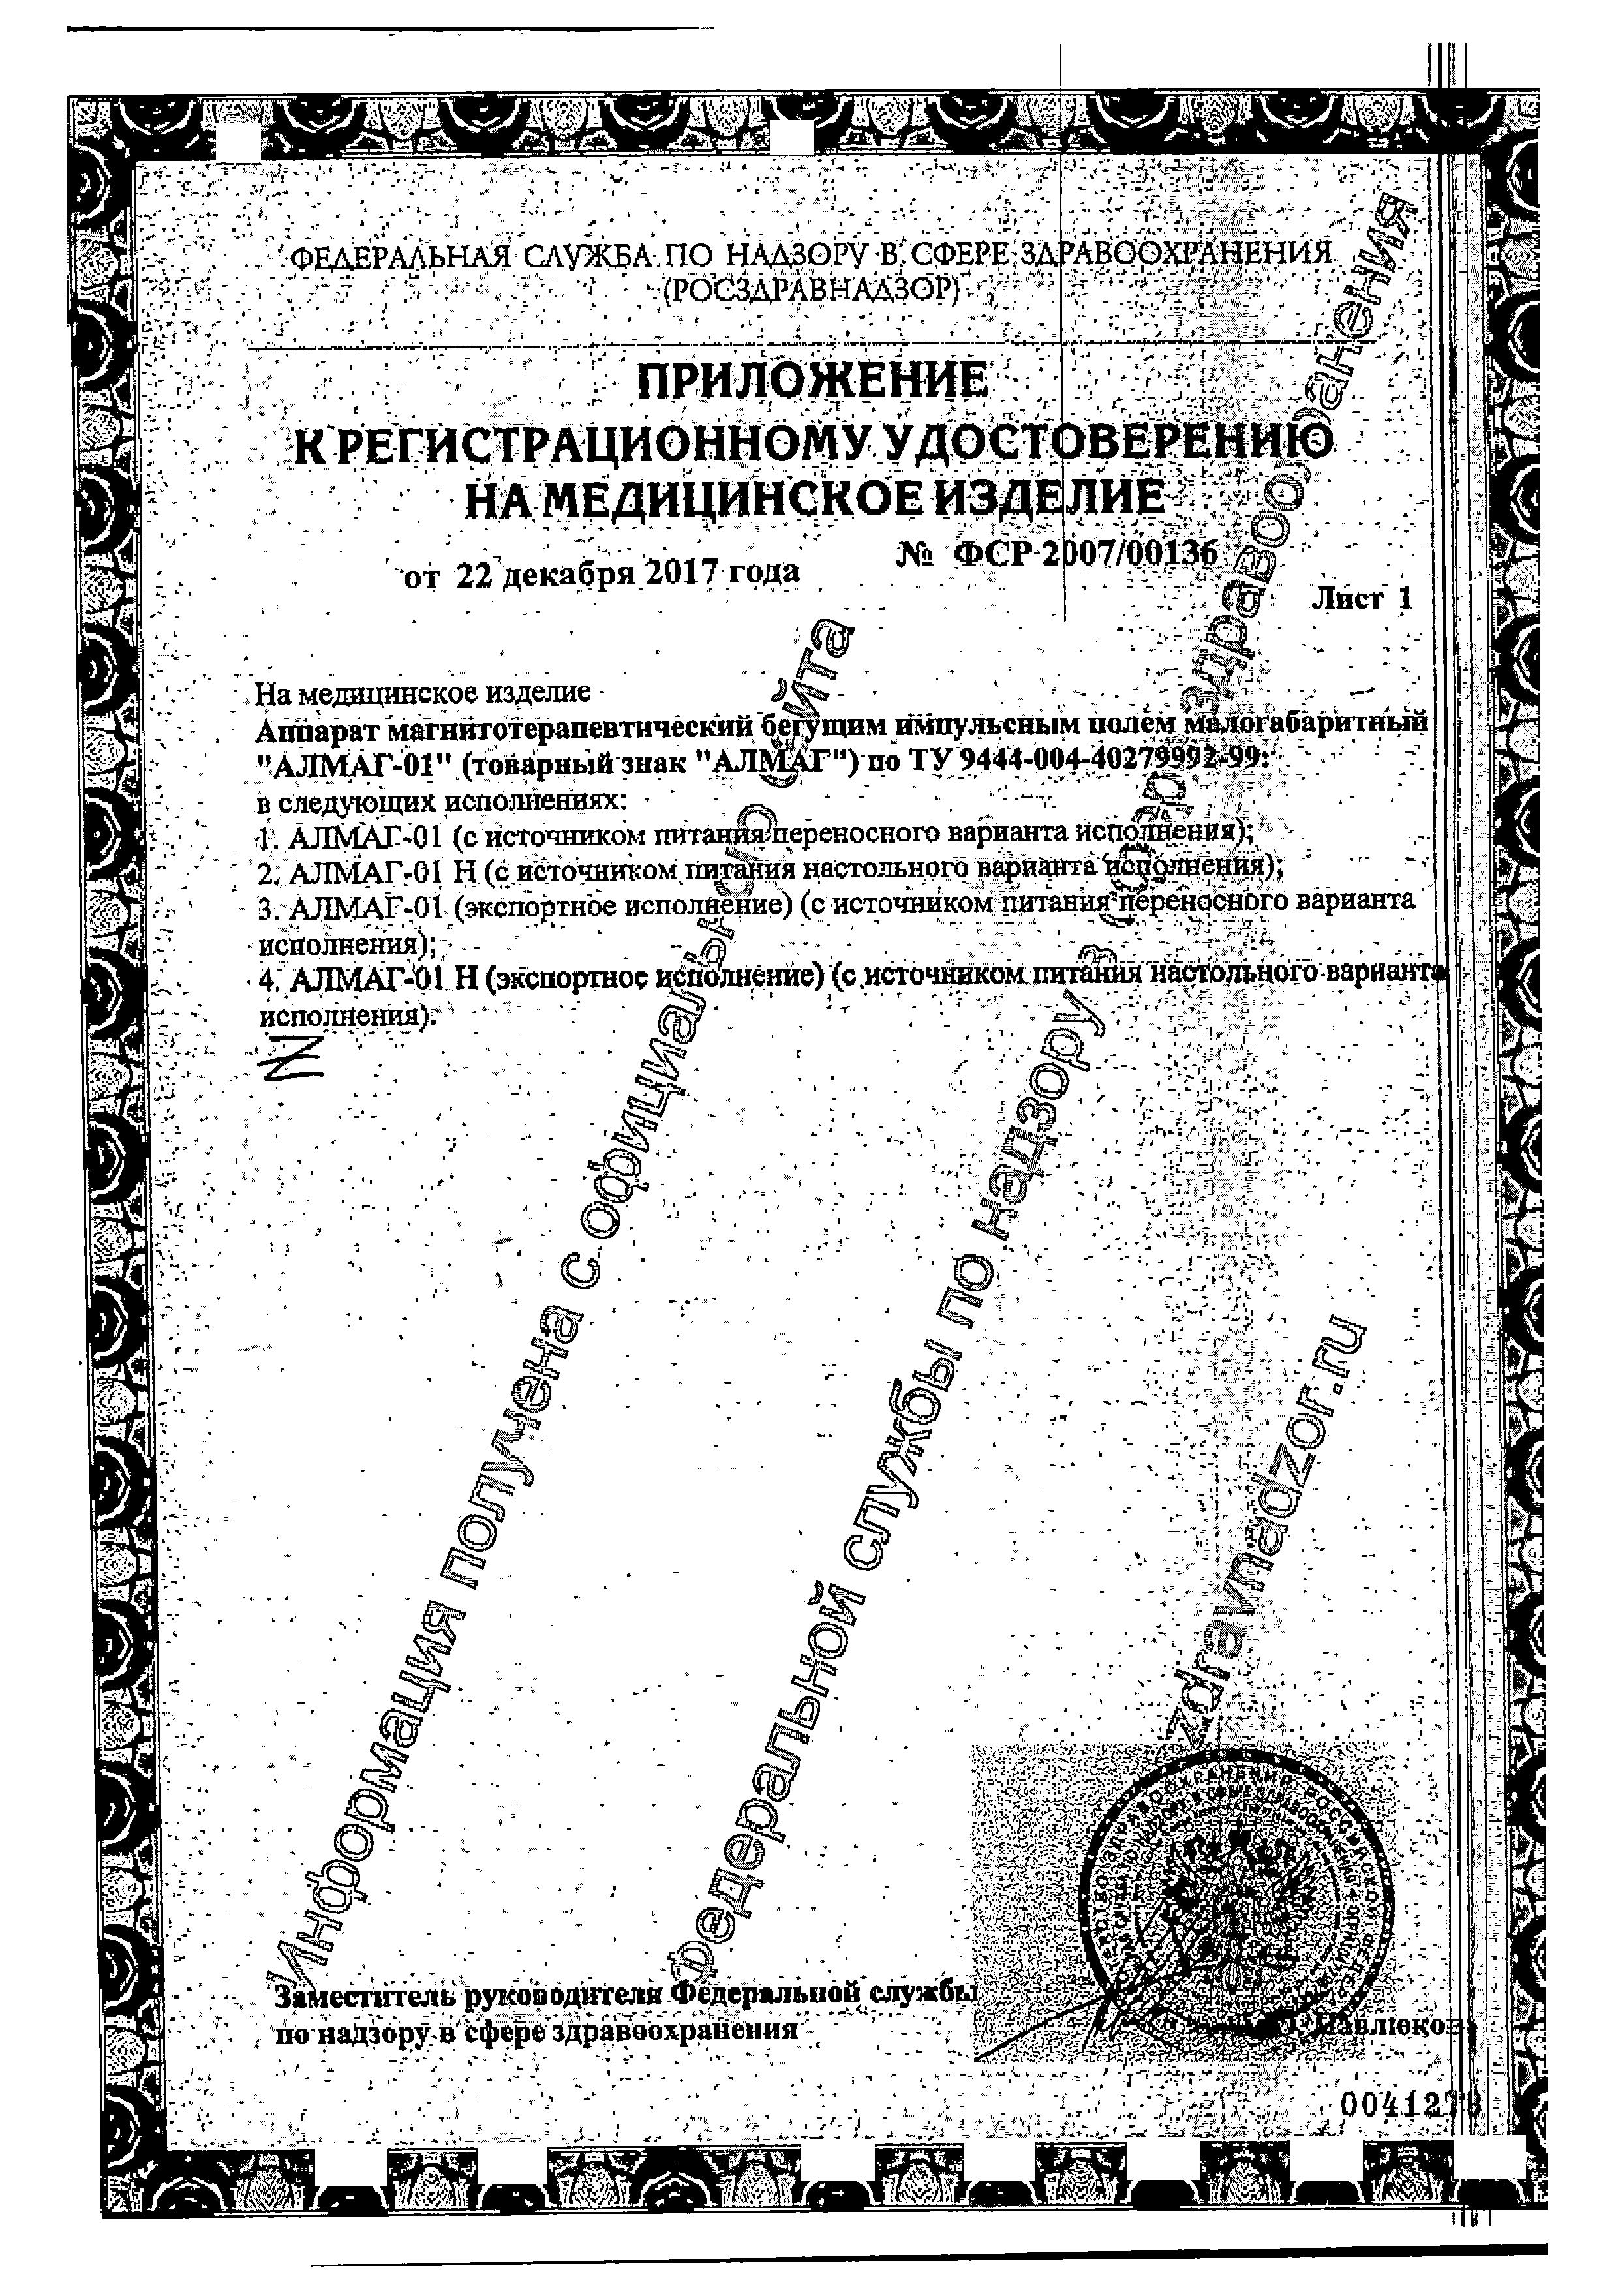 Алмаг-01